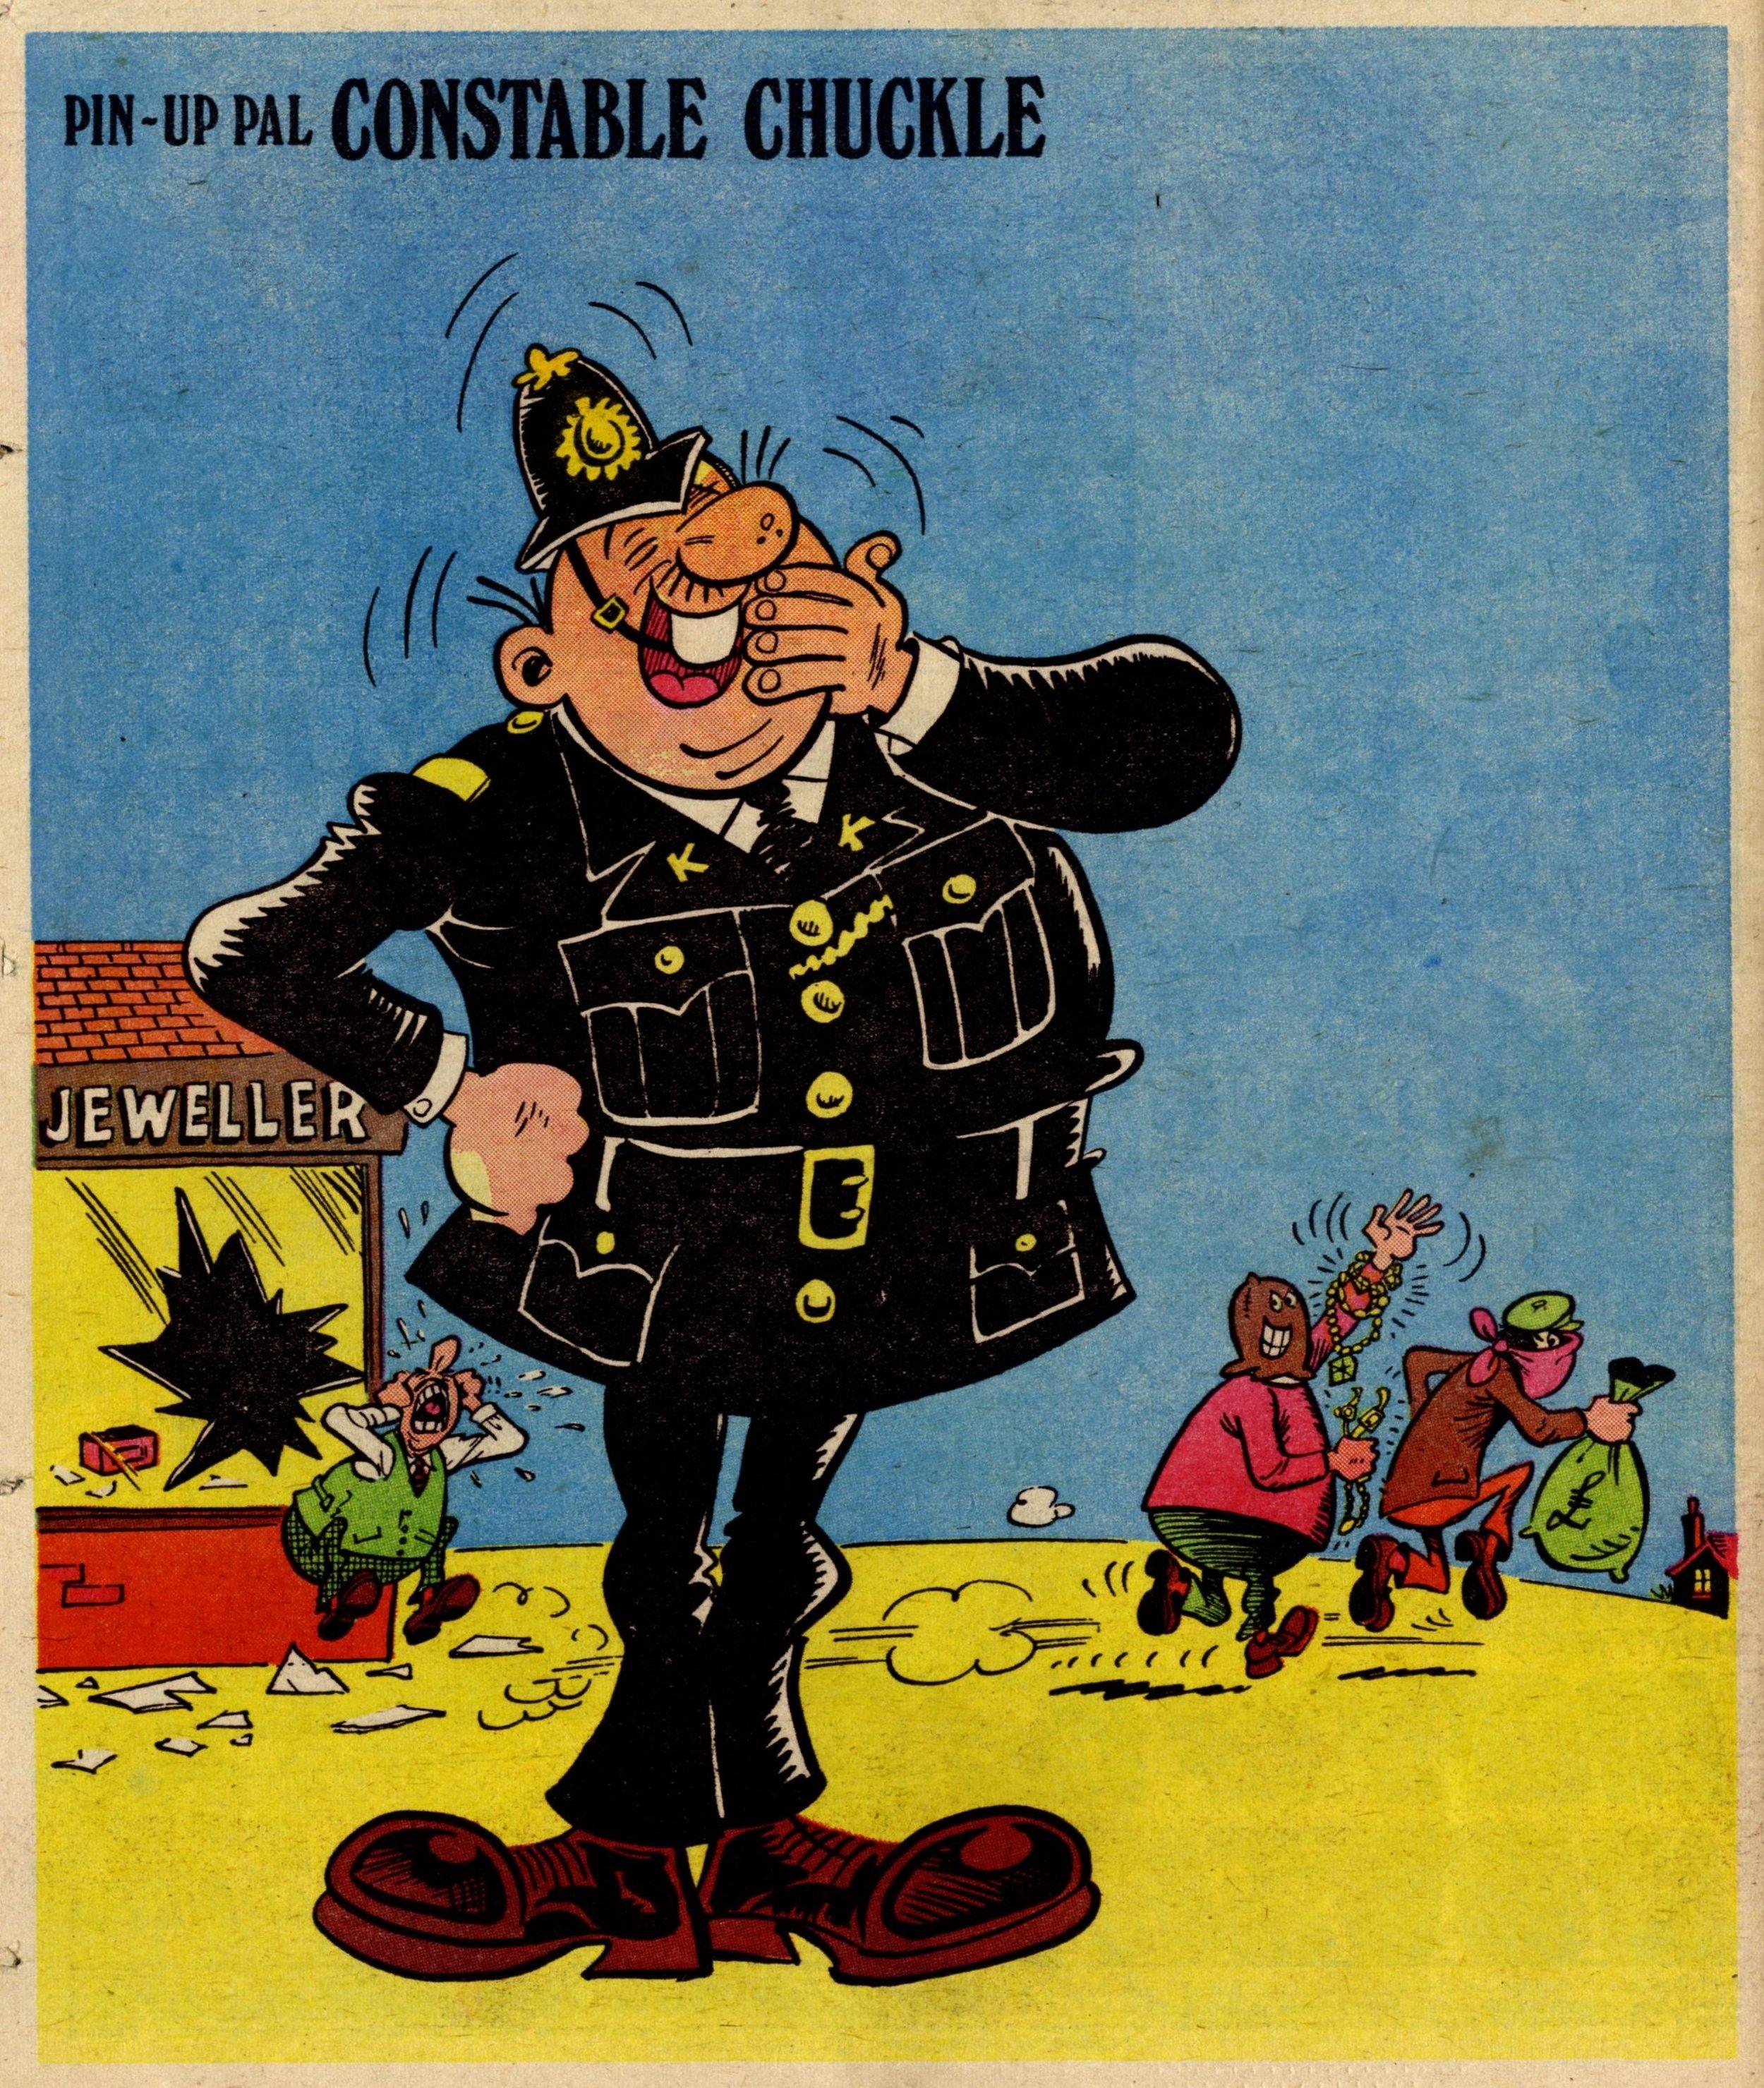 Pin-up Pal: Constable Chuckle (artist Frank McDiarmid), 22 April 1978